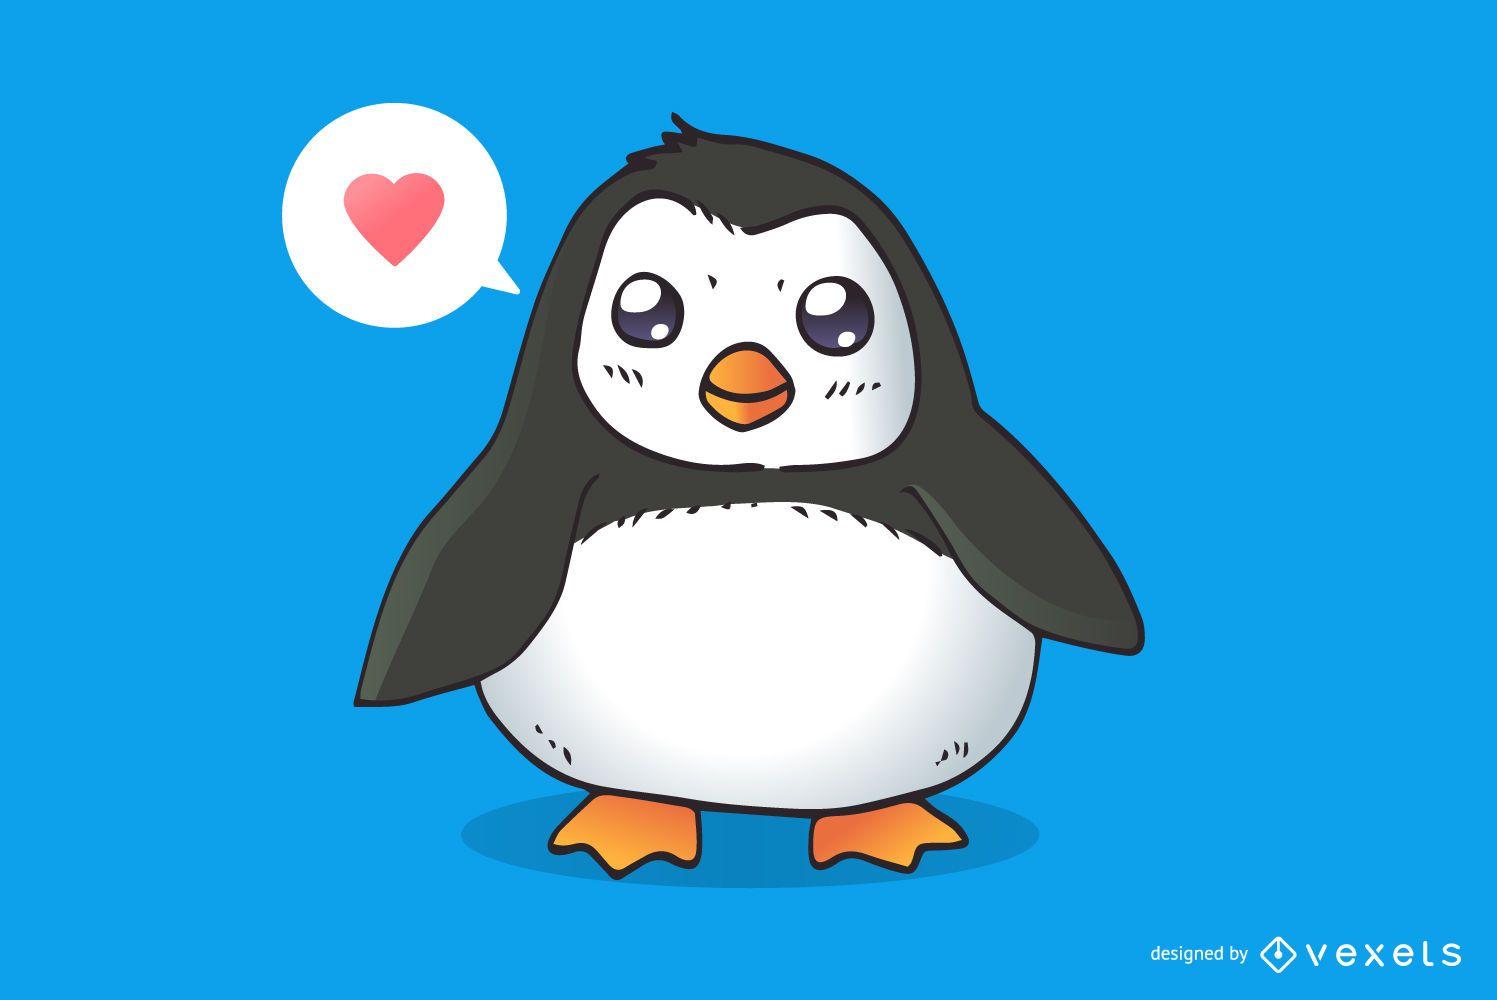 Caricatura lindo pingüino amoroso